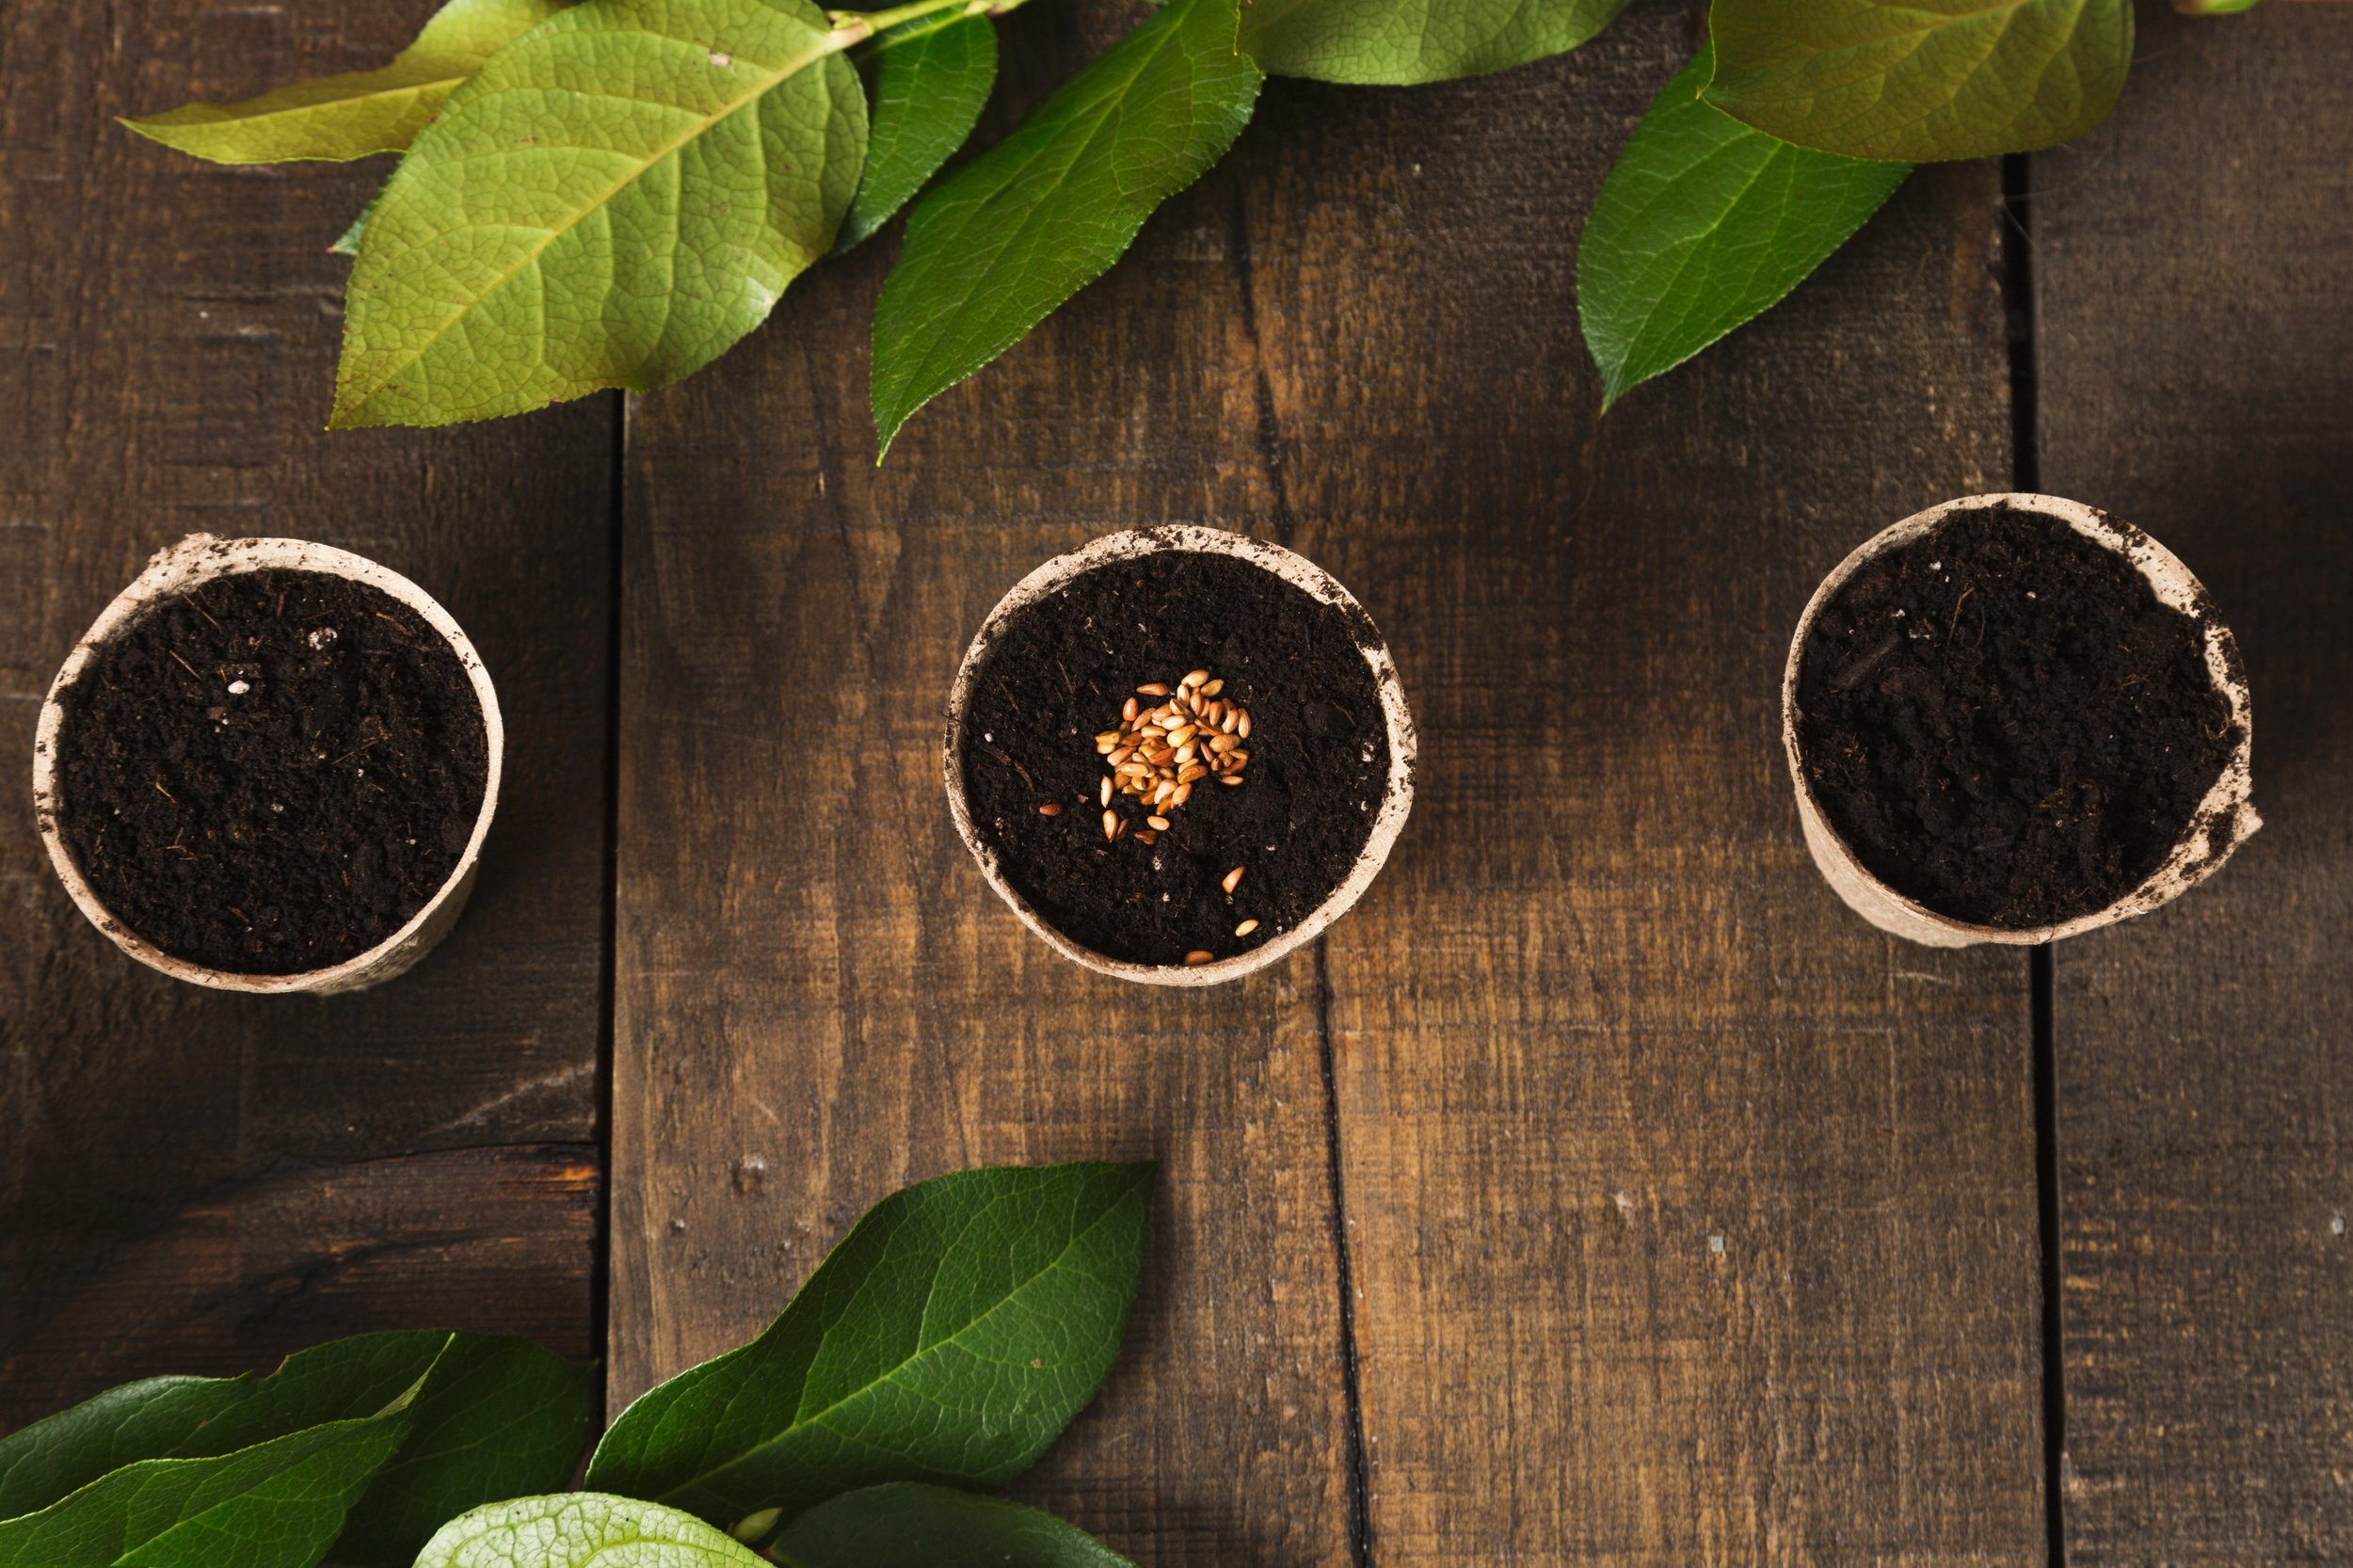 greenhouse-gardening_4460x4460.jpg